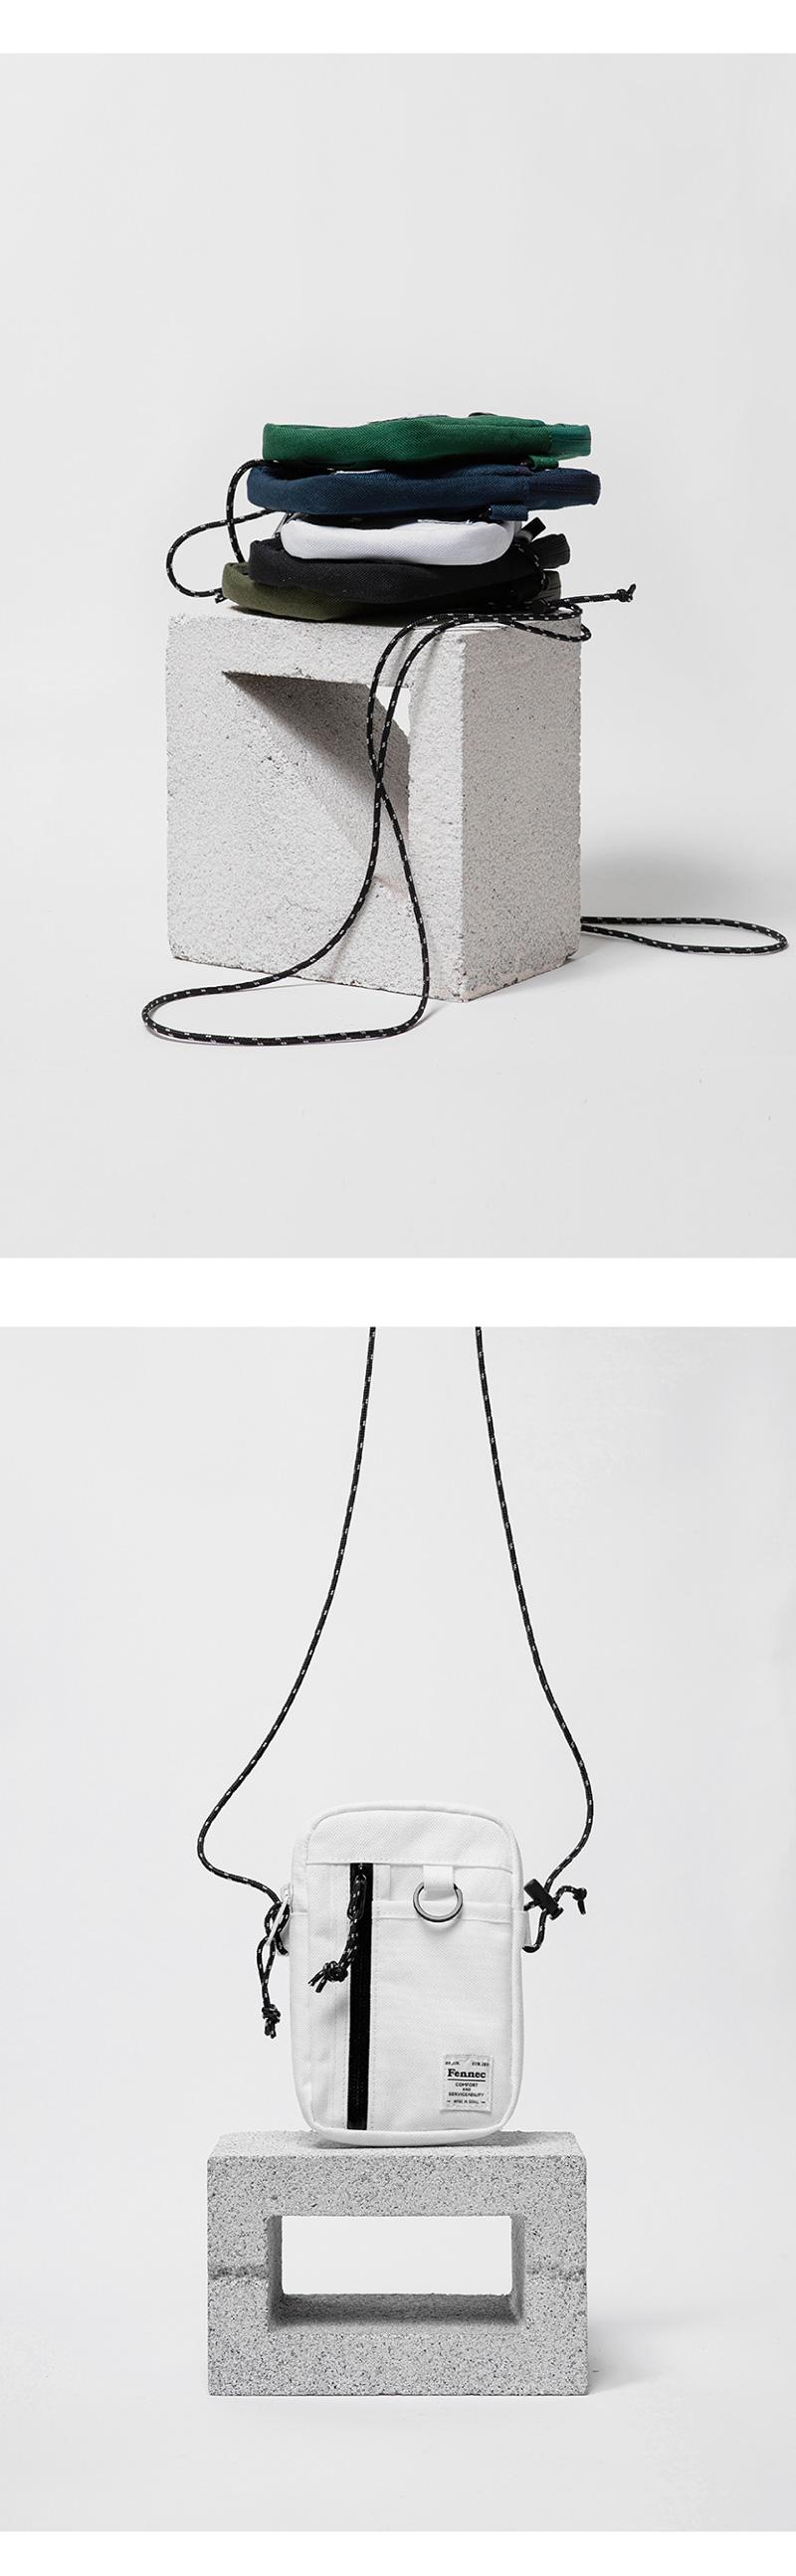 10x10-C_S-micro-bag-wh_02.jpg